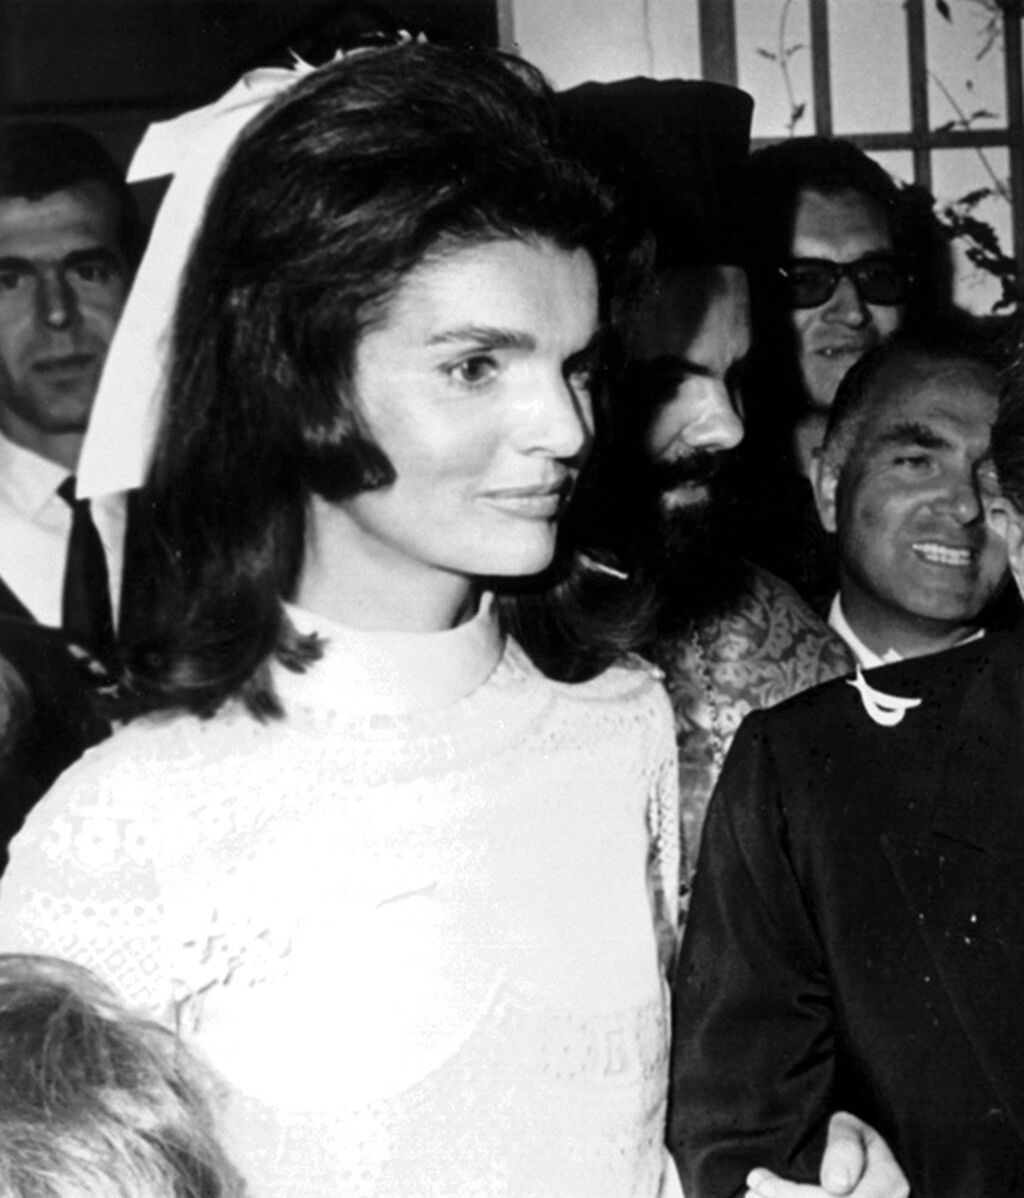 Vestido de novia en la boda con  Aristotles Onassis